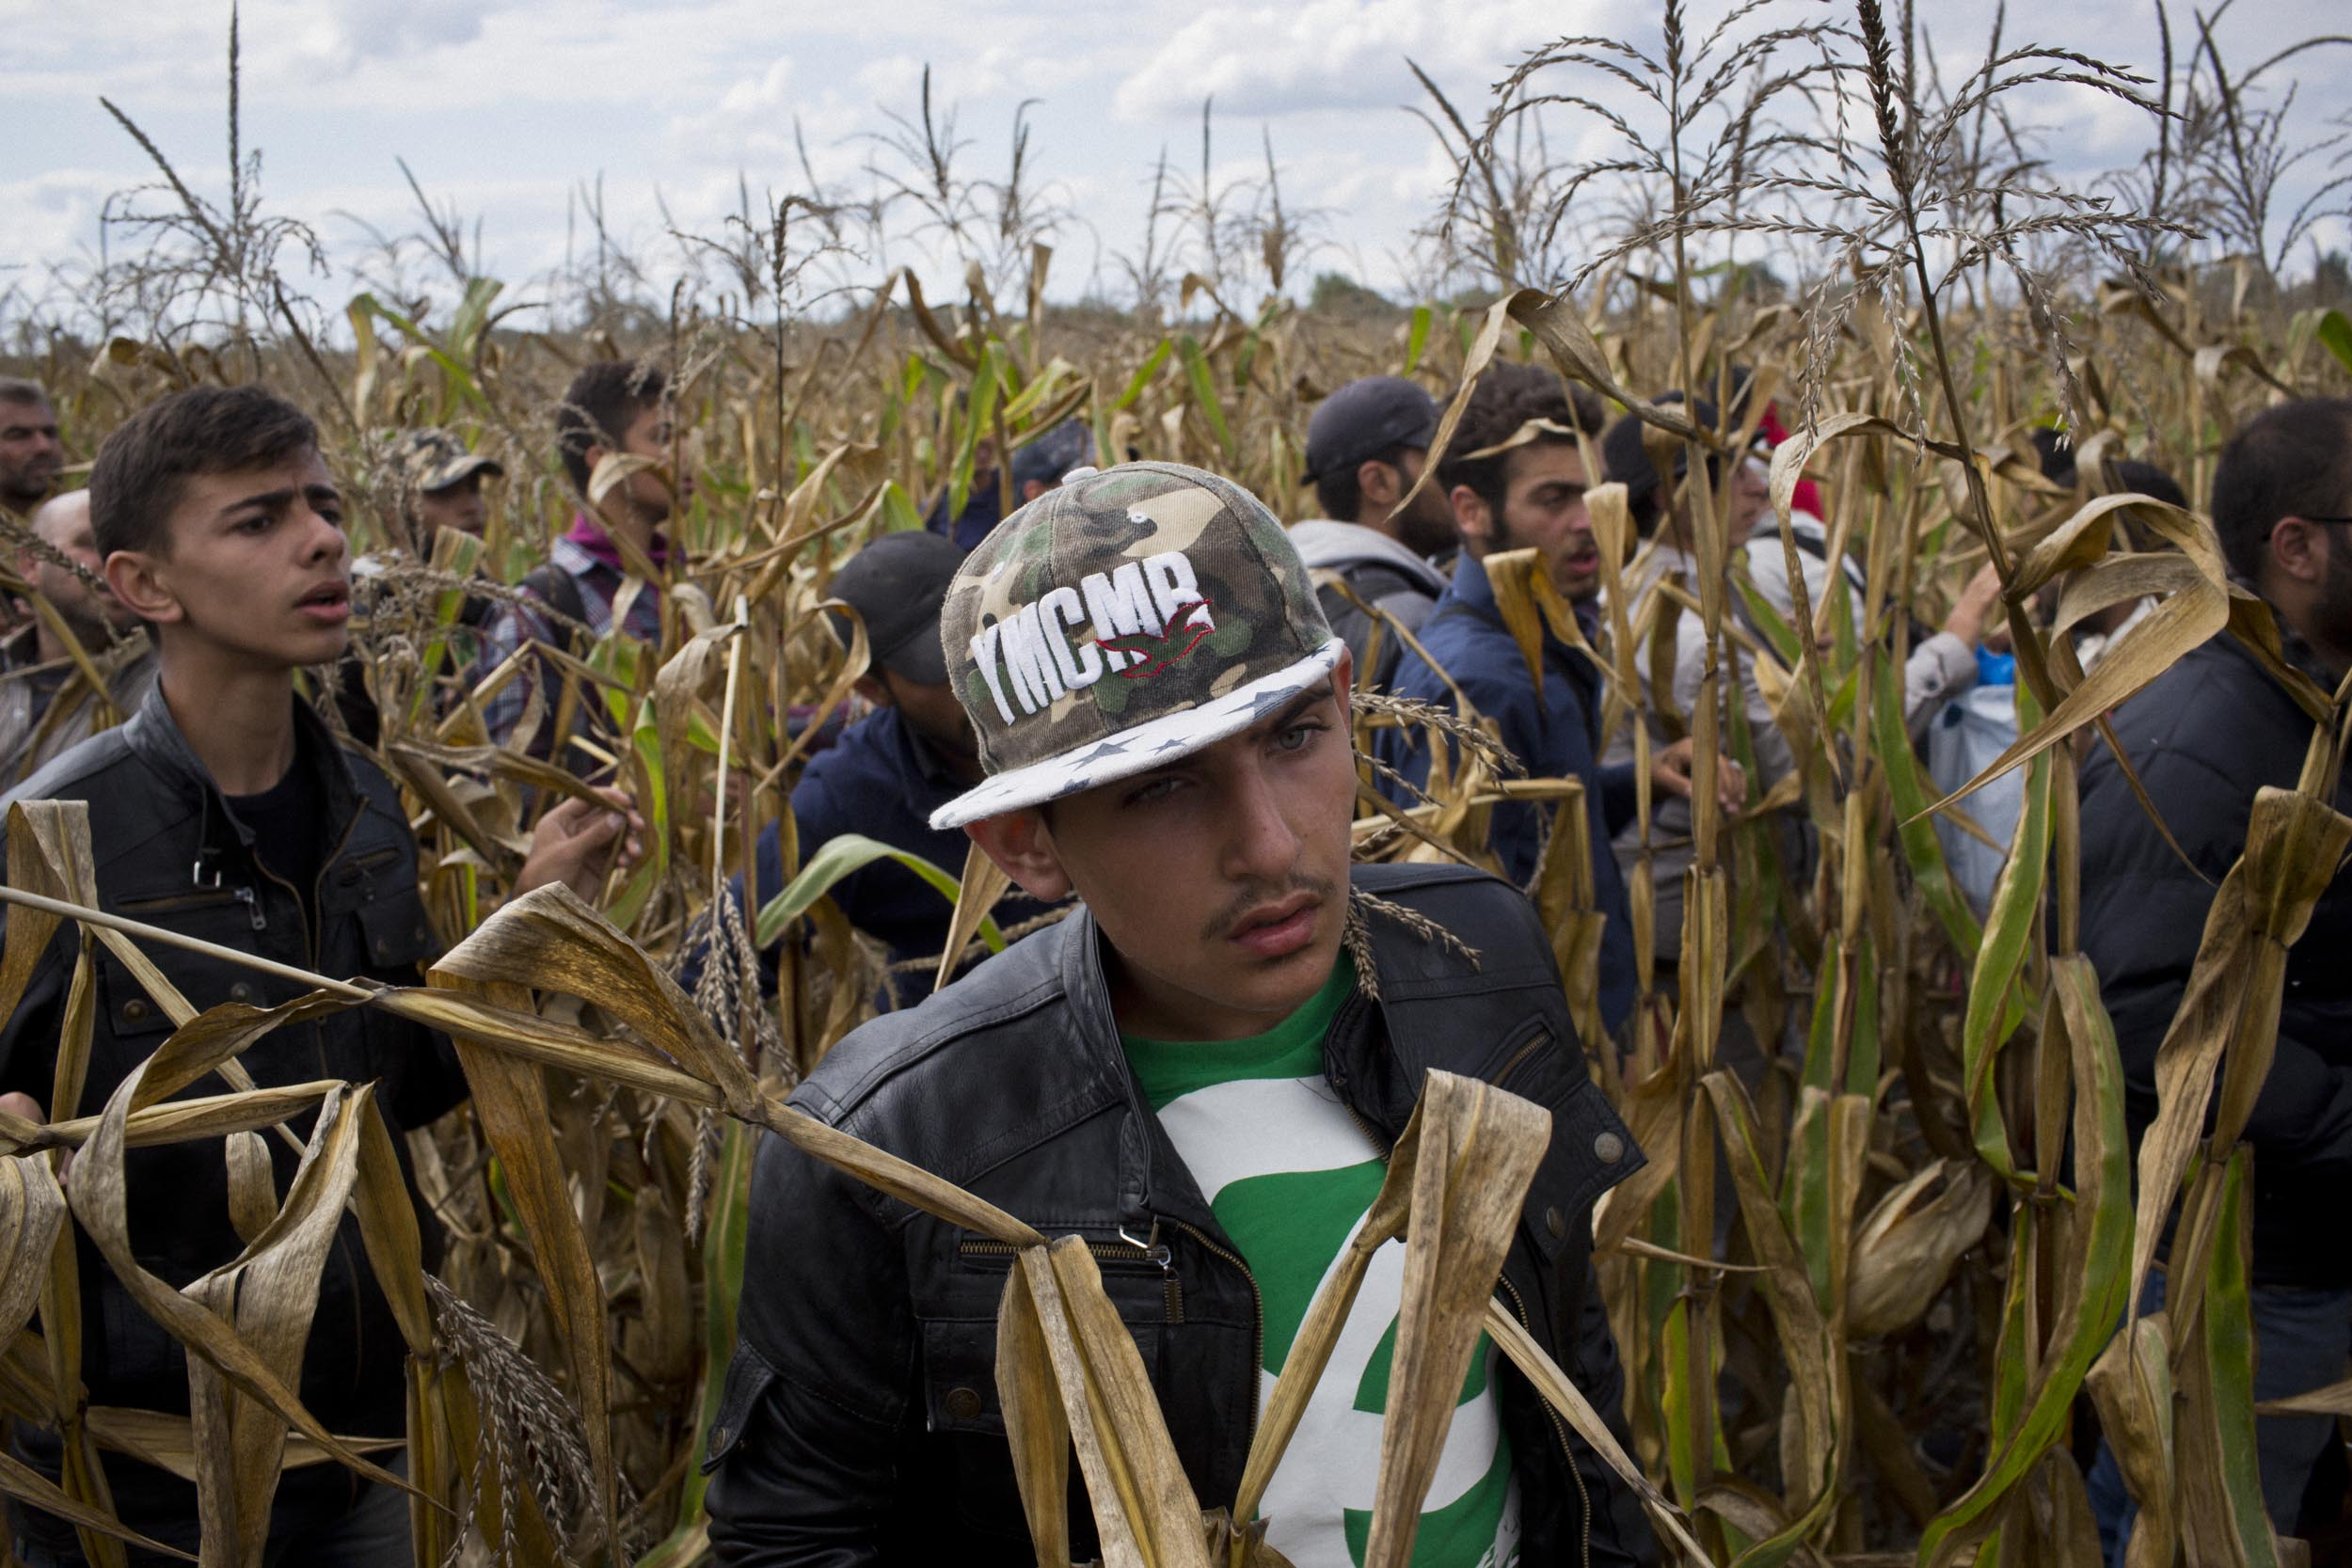 Röszke, Hungary. Refugees flee through cornfields evading police near the Hungary/Serbia border.